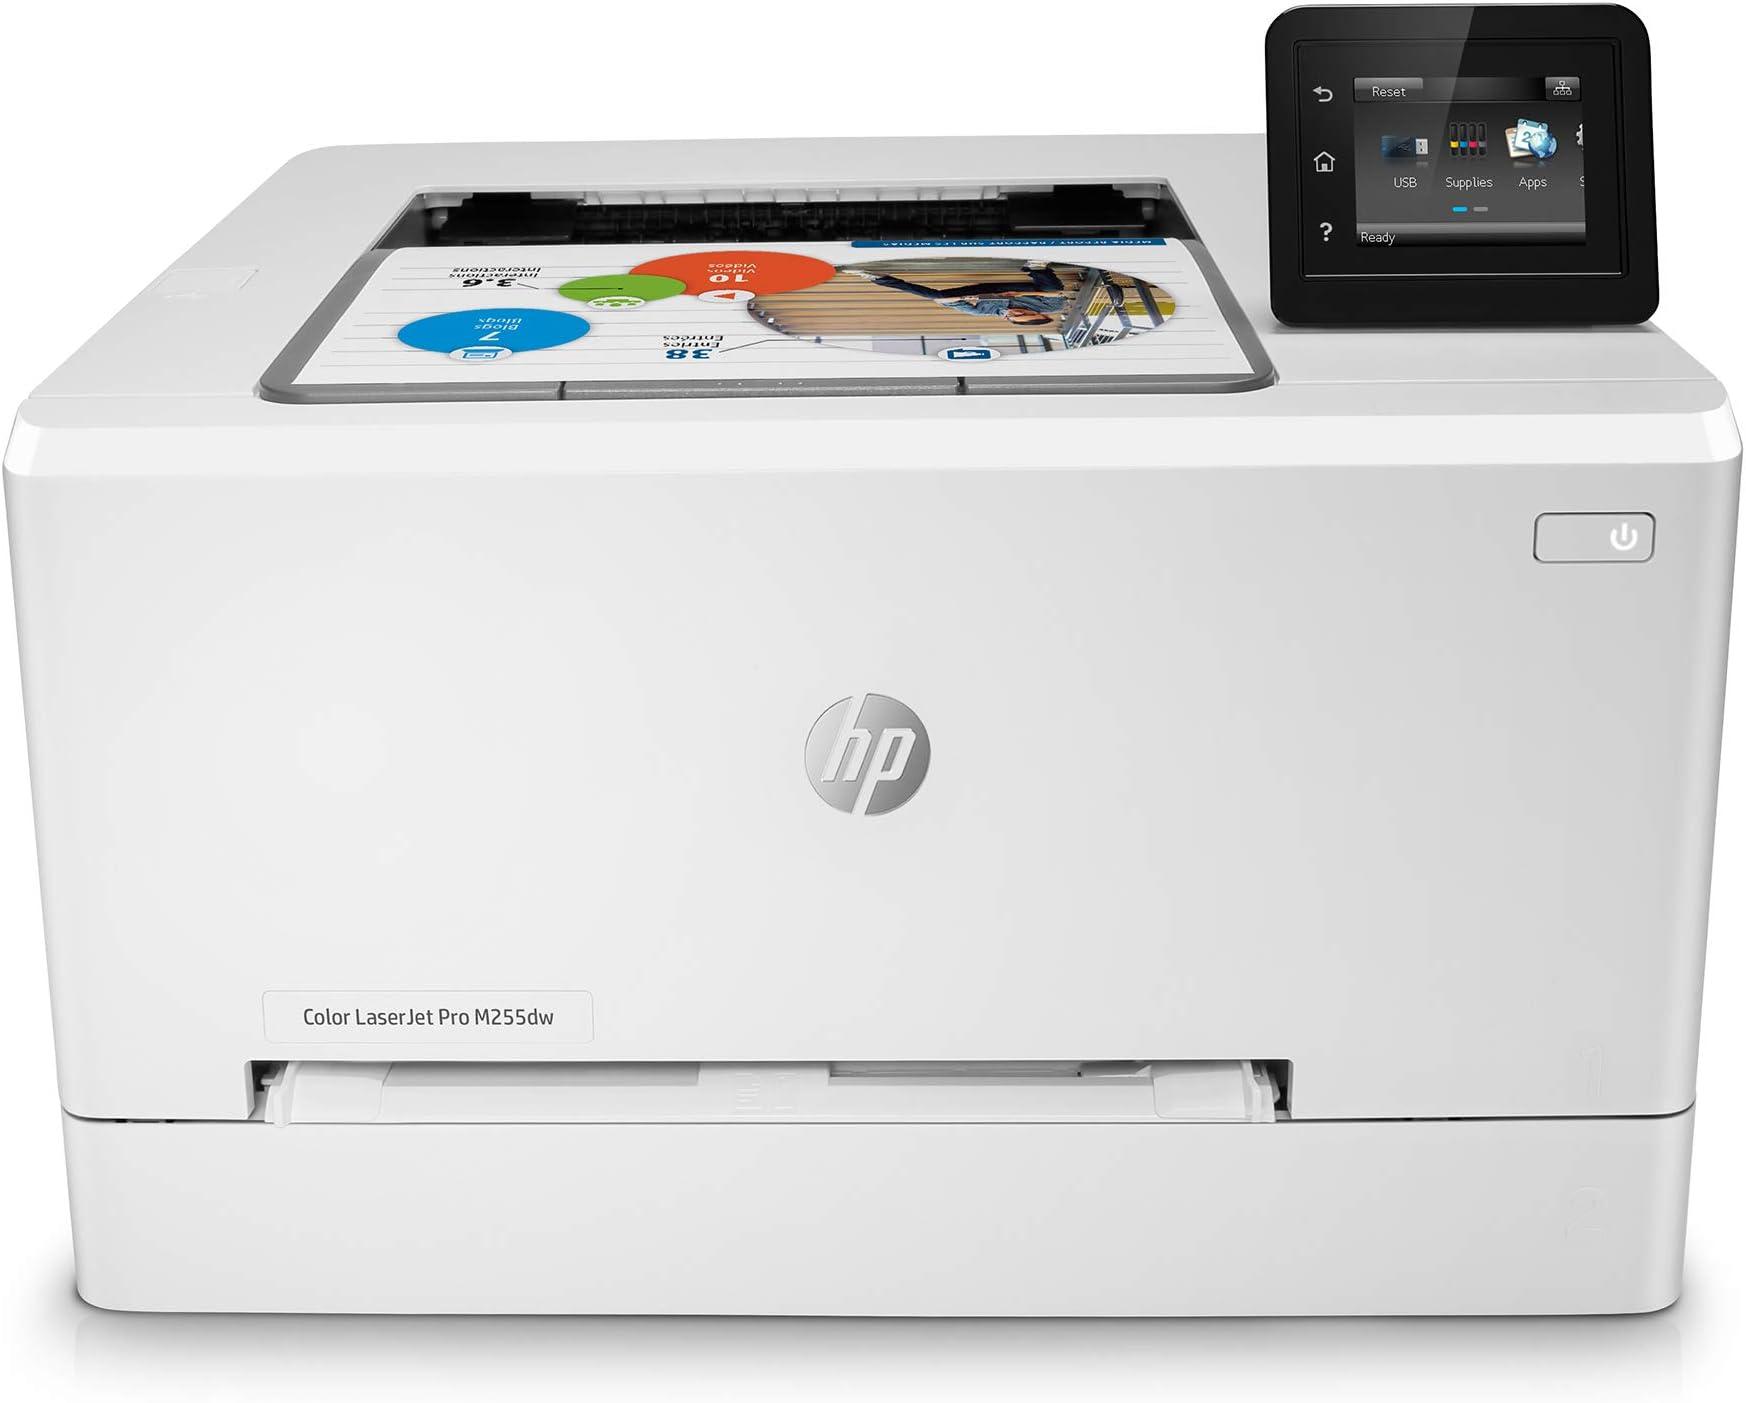 HP Color LaserJet Pro M255dw Wireless Laser Printer, Remote Mobile Print, Duplex Printing, Works with Alexa (7KW64A)